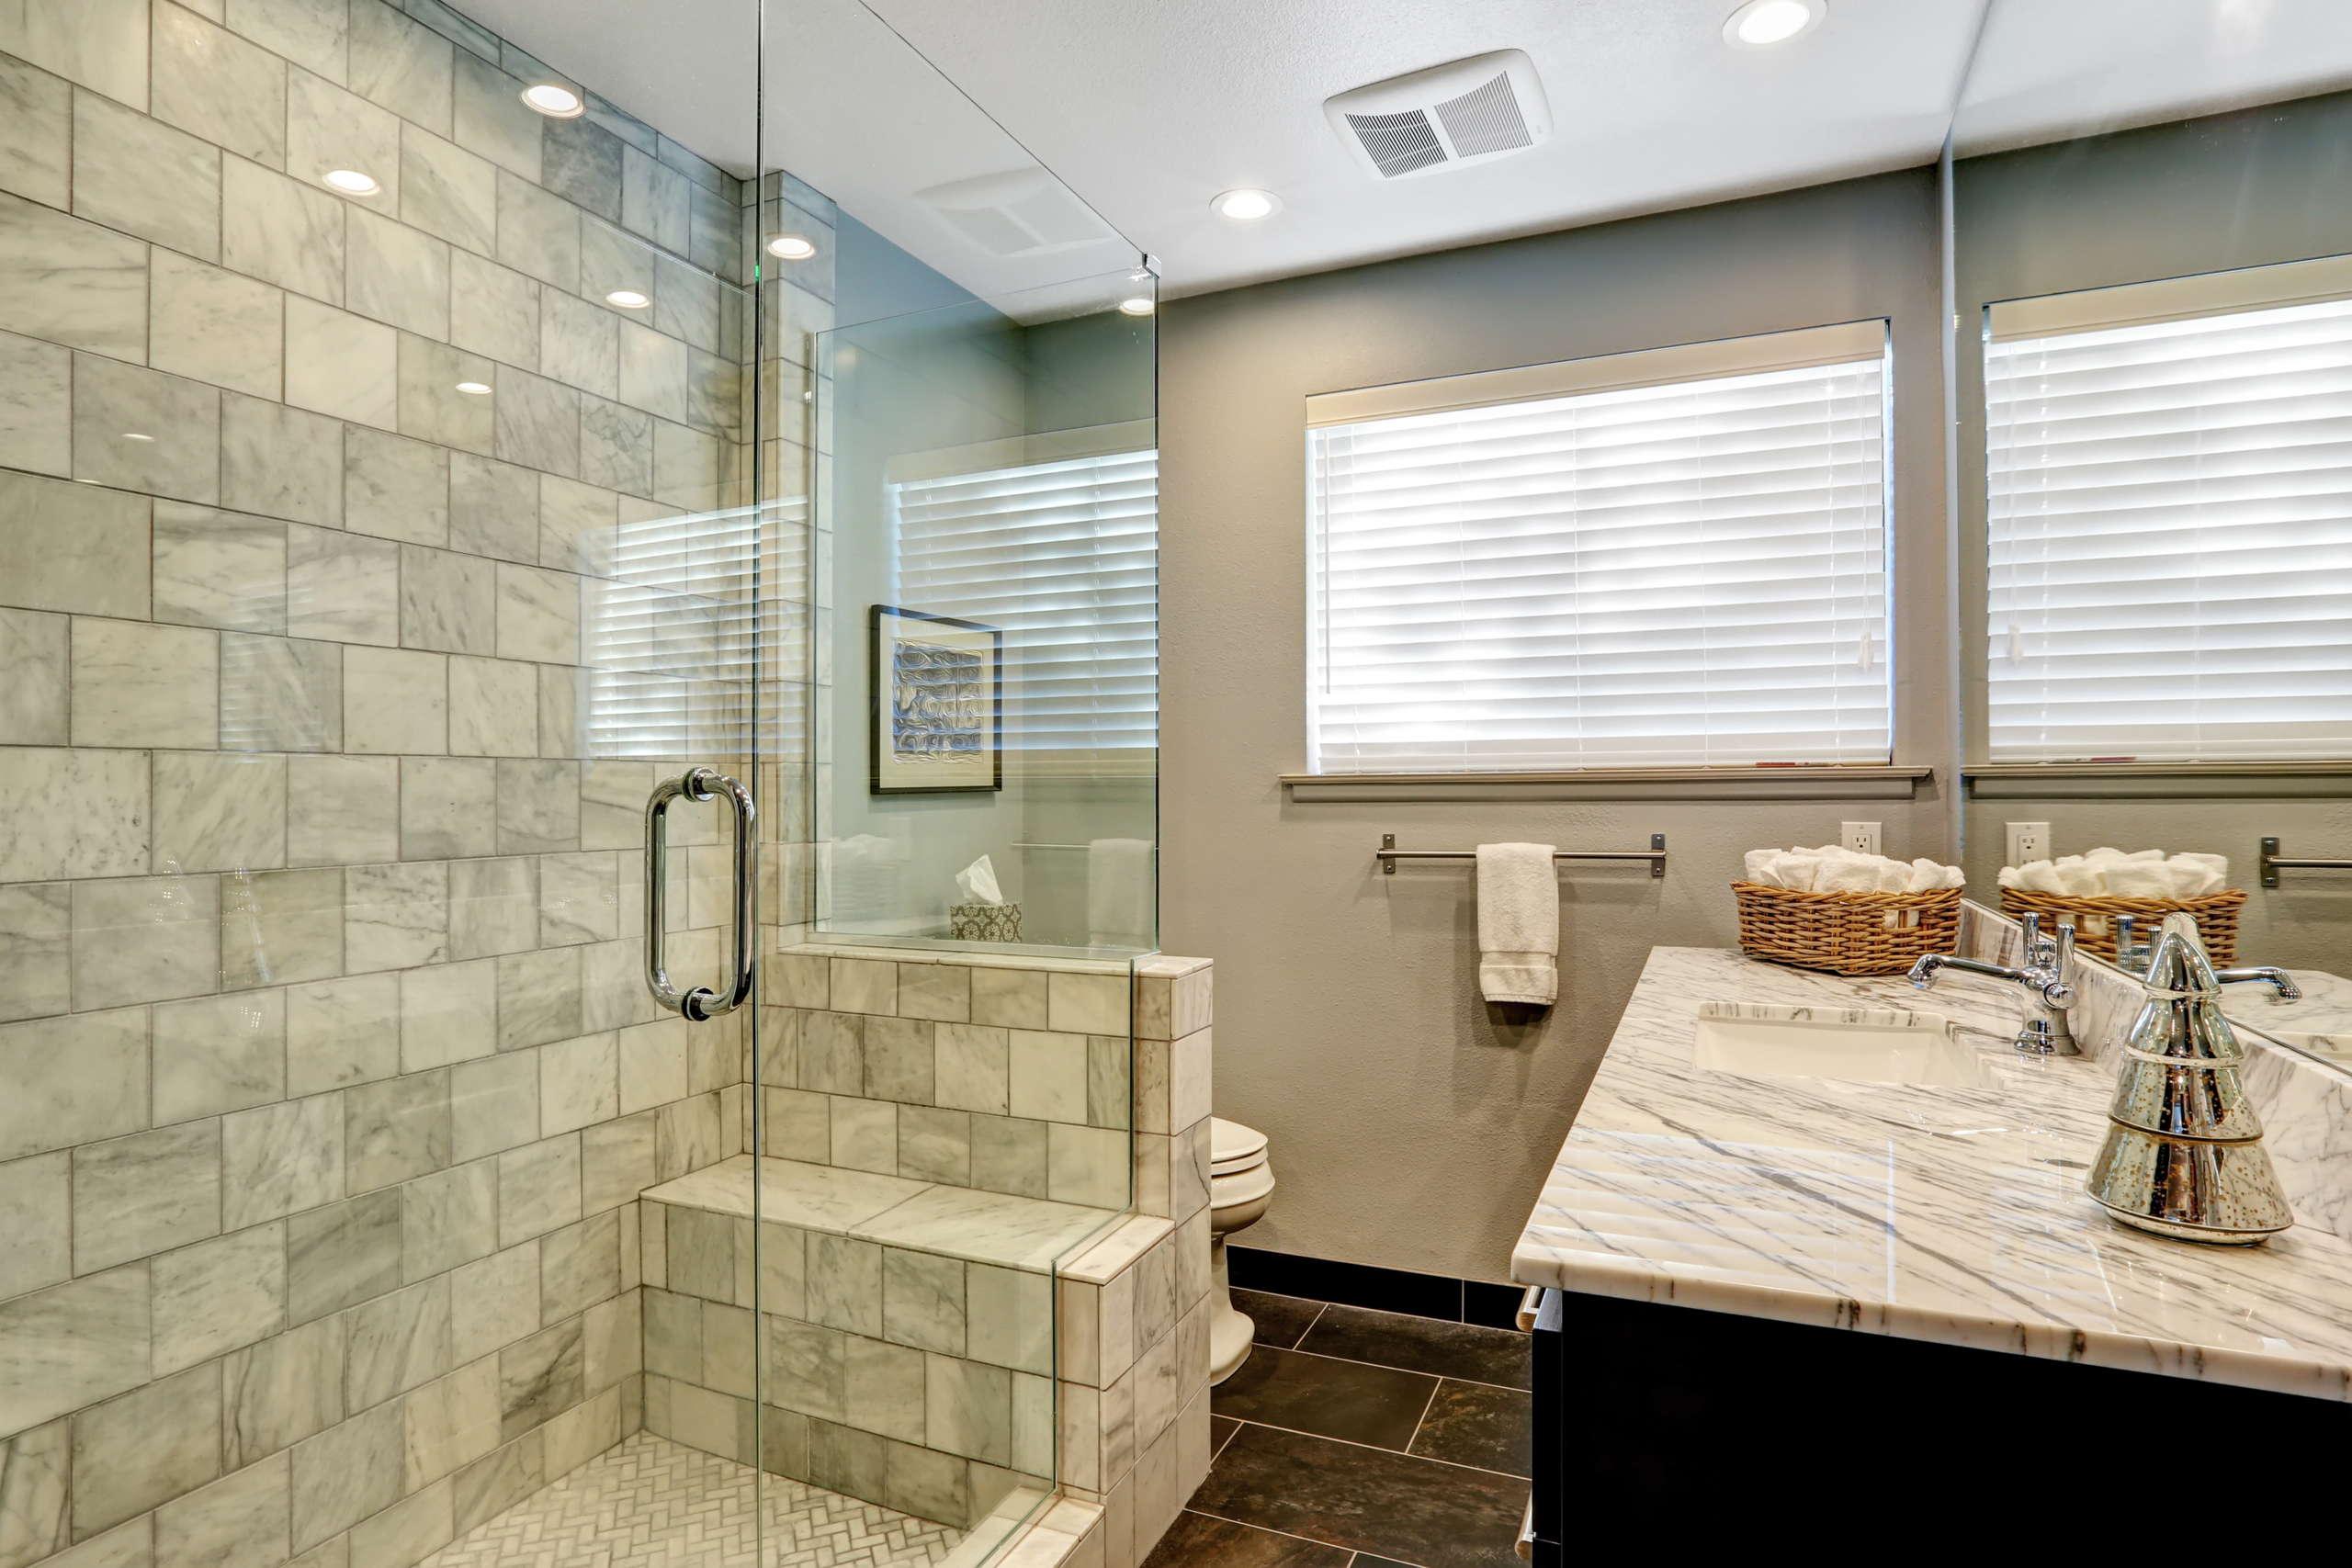 https://americanexpress-construction.com/wp-content/uploads/2015/05/bathroomremodel1.jpg